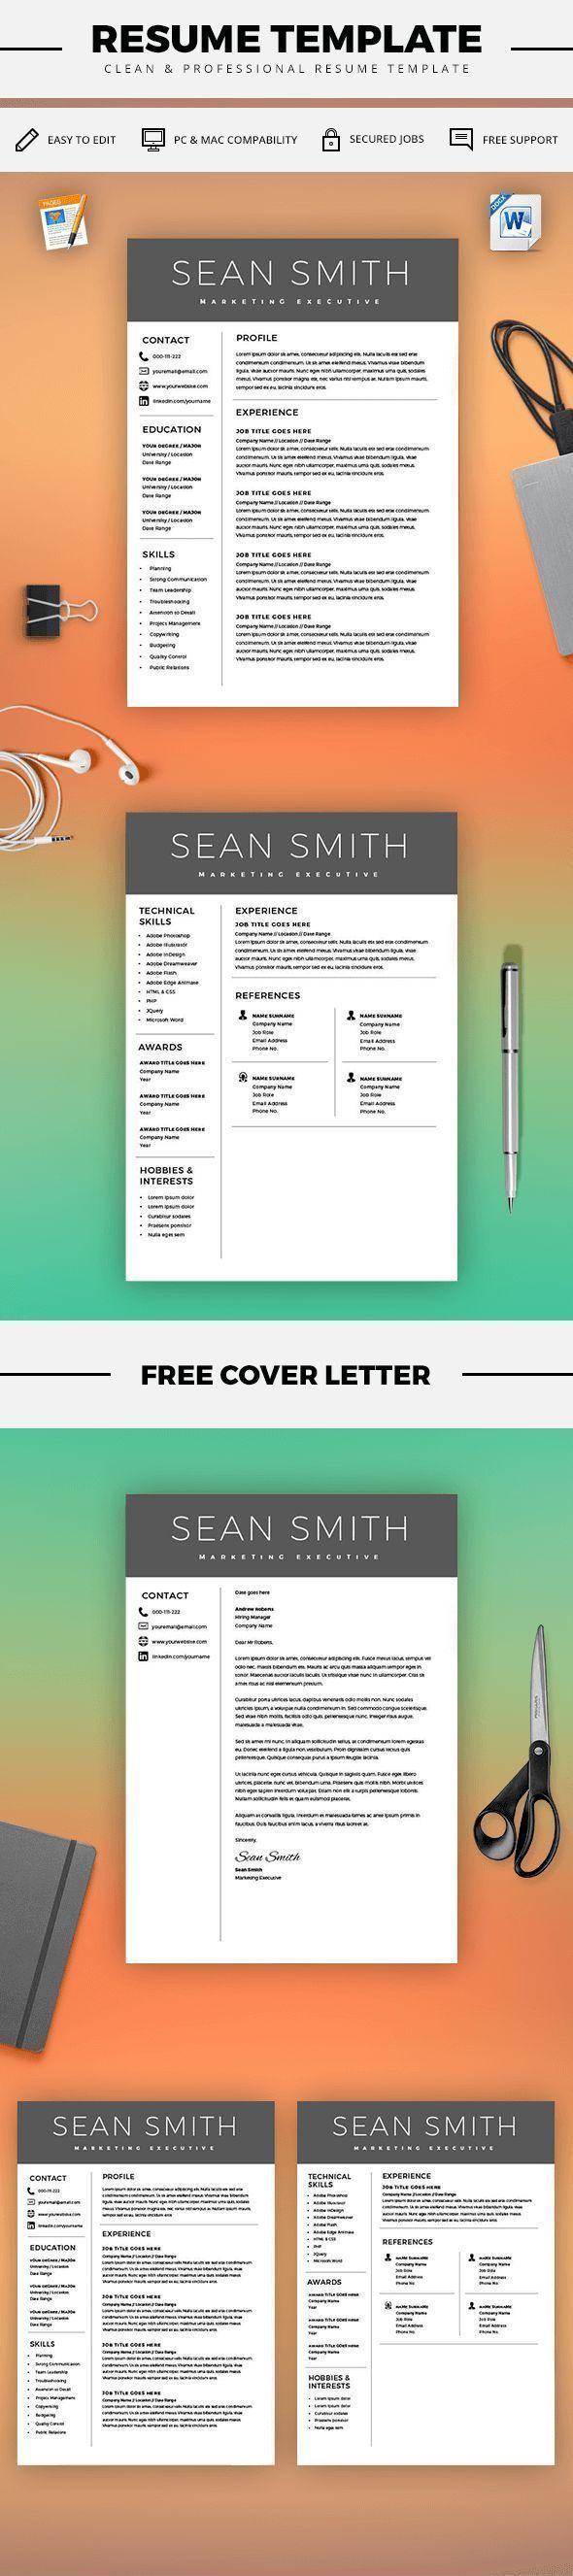 Curriculum Vitae Template - Professional Resume Template + Cover ...